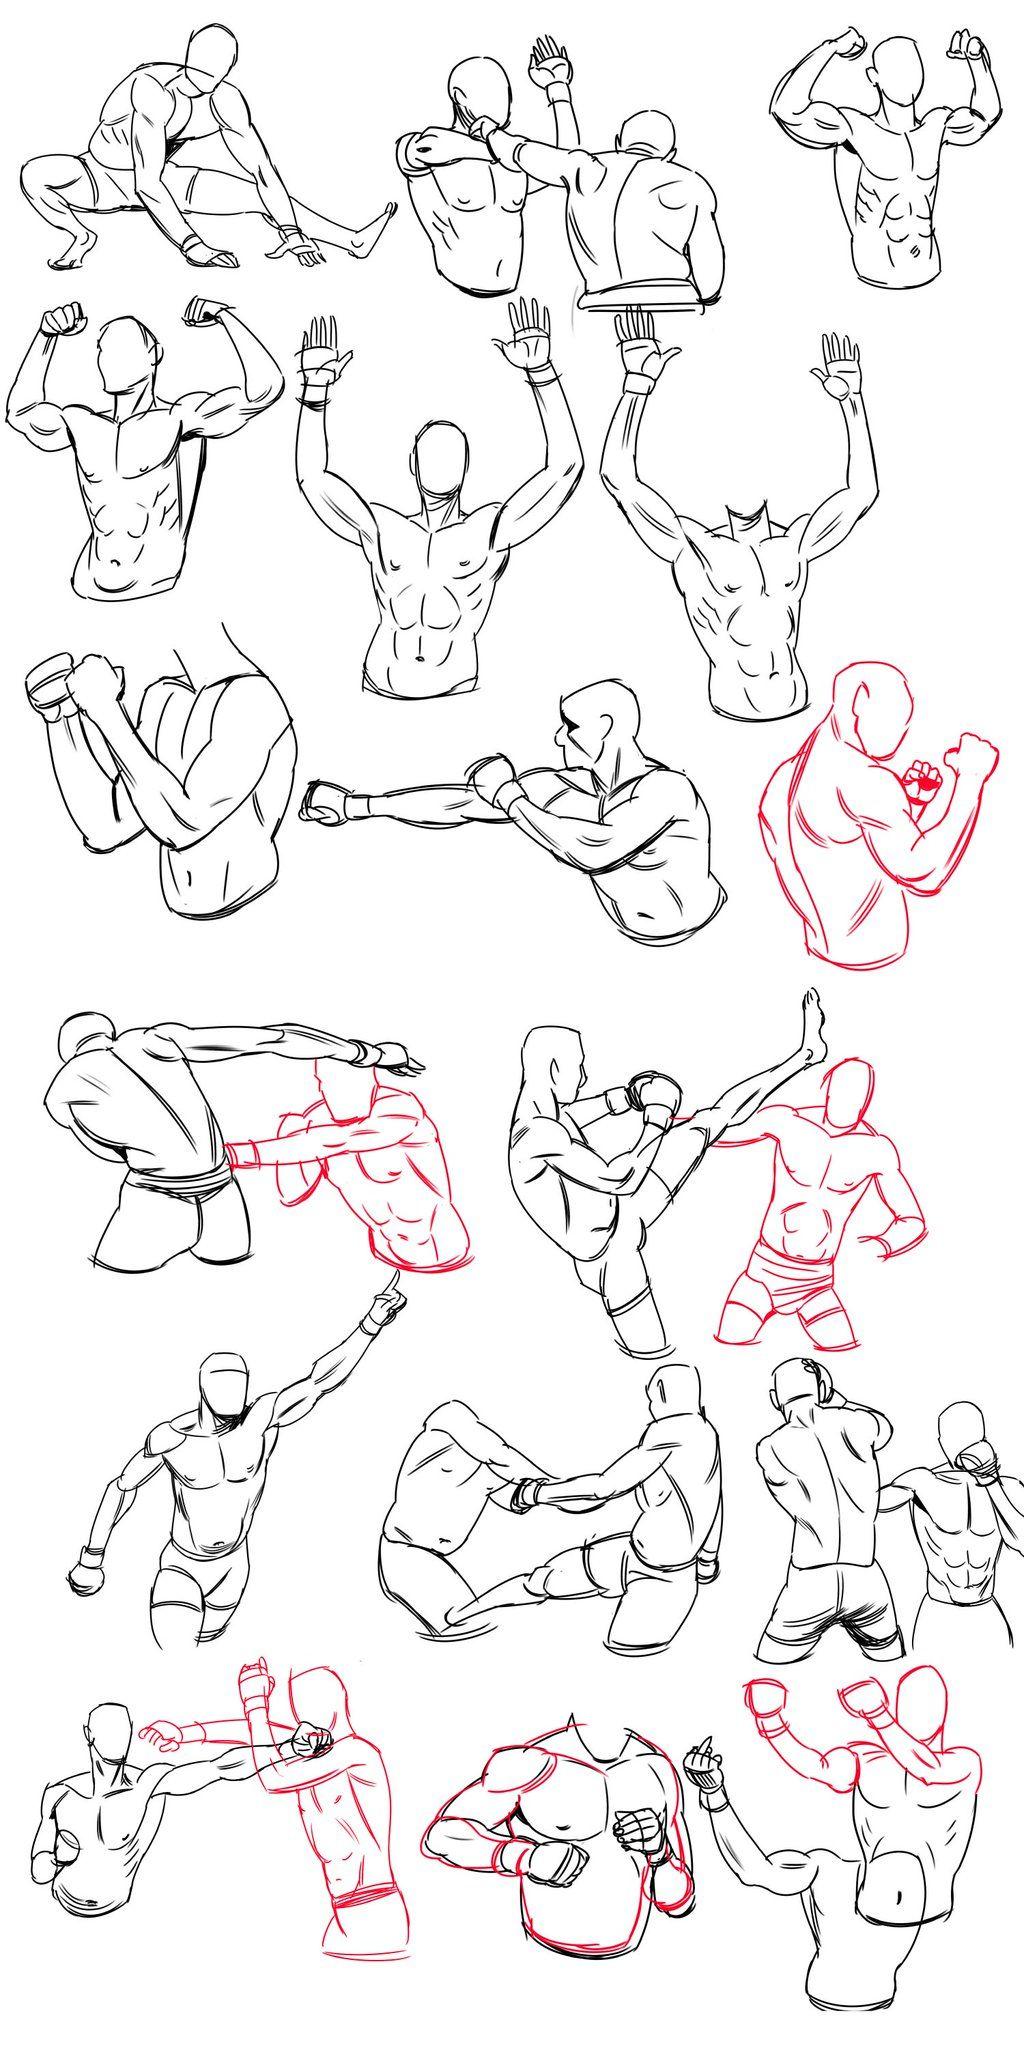 ʹ€ì¤'ì²joongchelkim On Twitter Art Reference Poses Figure Drawing Figure Drawing Reference